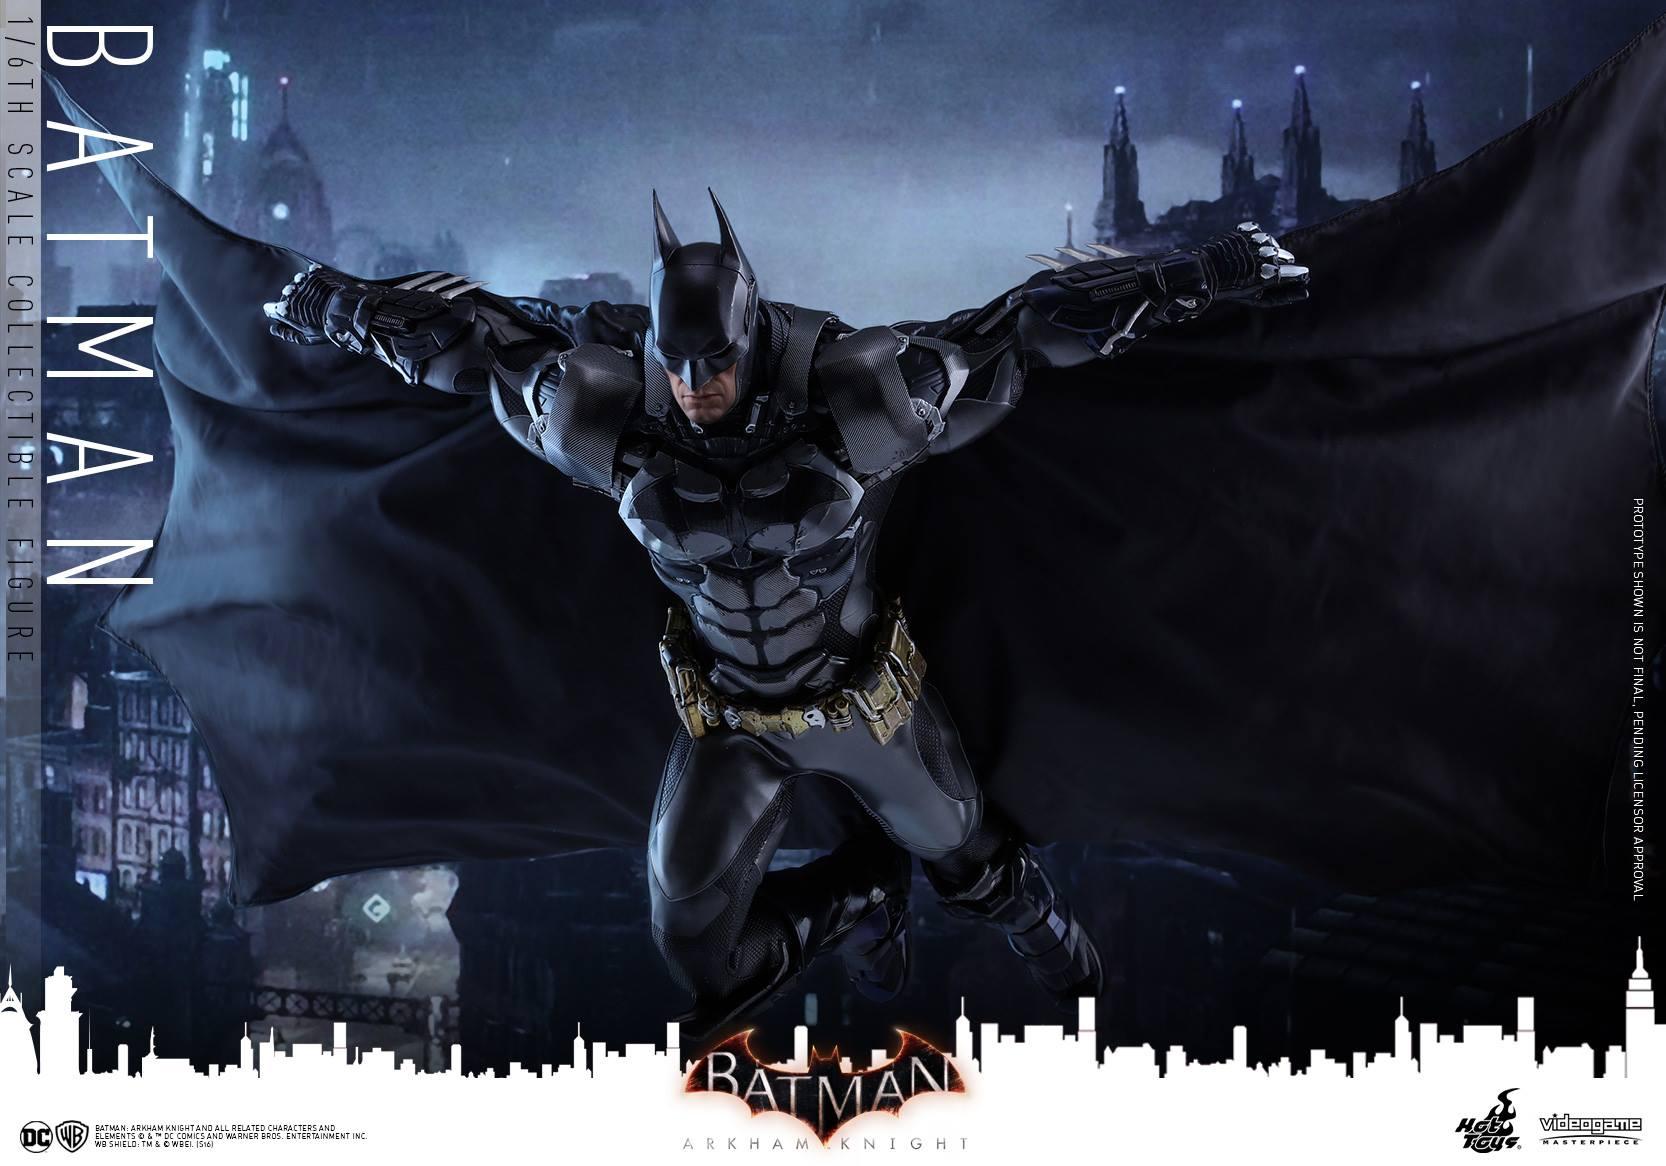 Hot Toys Batman: Arkham Knight Sixth Scale Figure Official Details